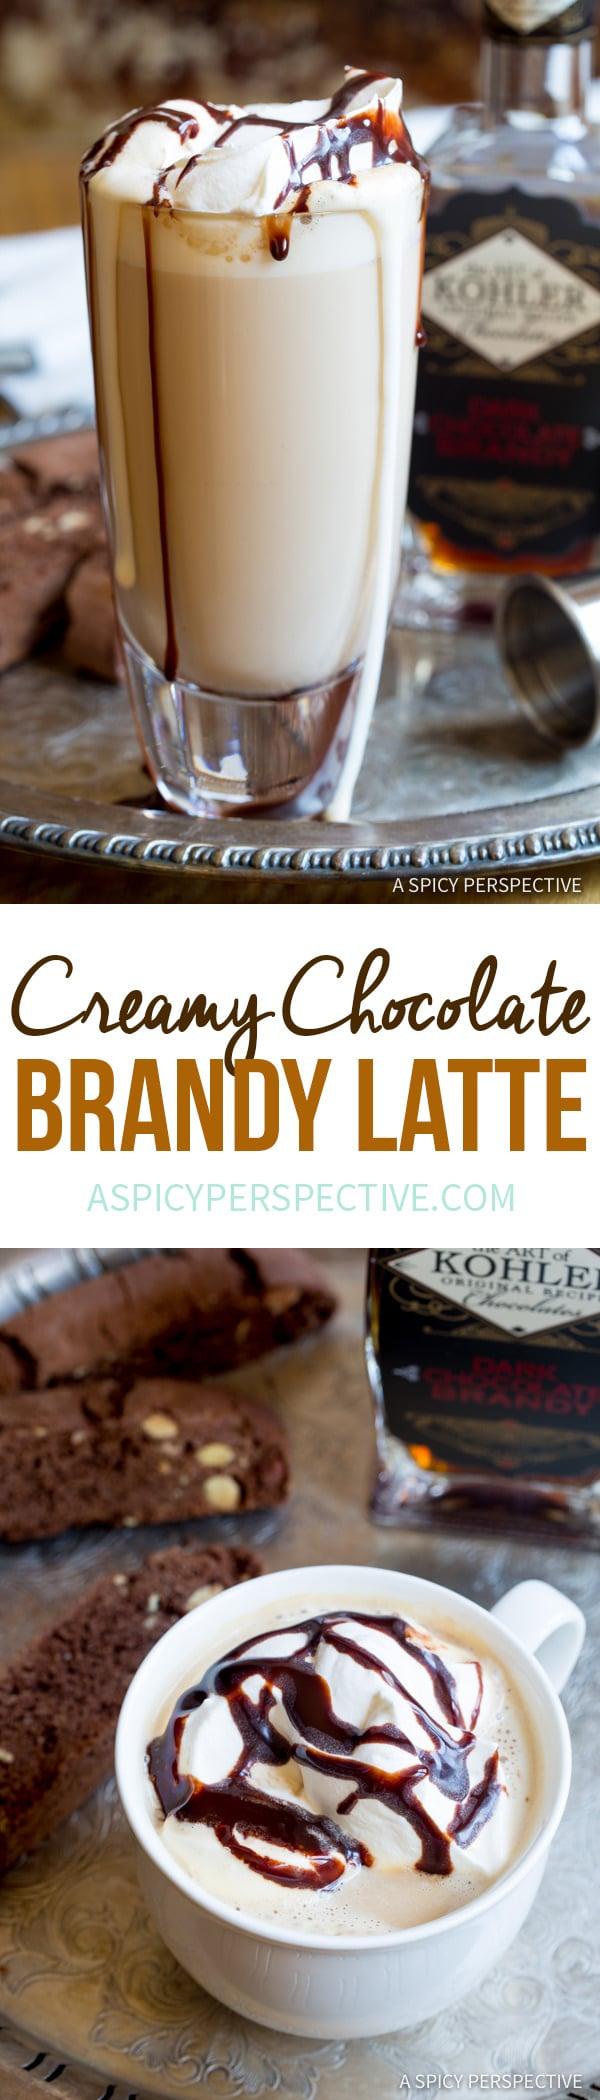 Creamy Chocolate Brandy Latte Recipe | ASpicyPerspective.com